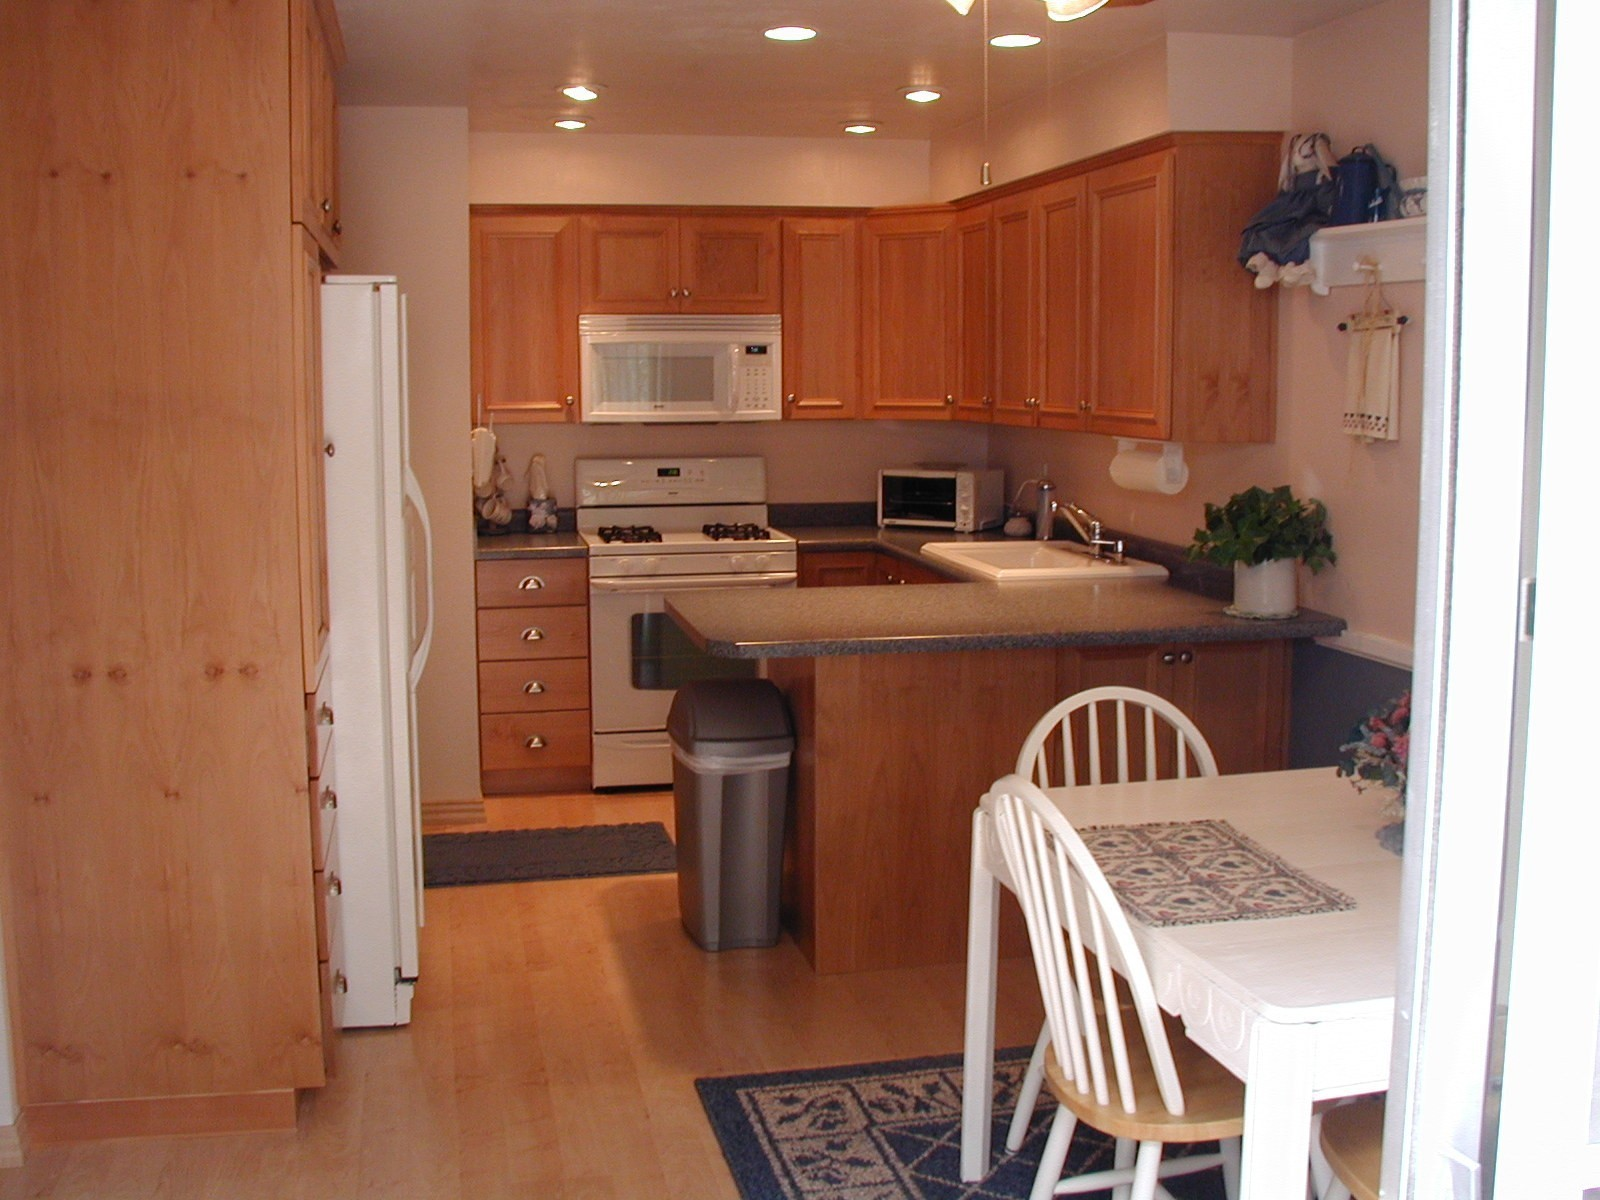 lighting kitchen no island kitchen lighting Lighting in kitchen with no island